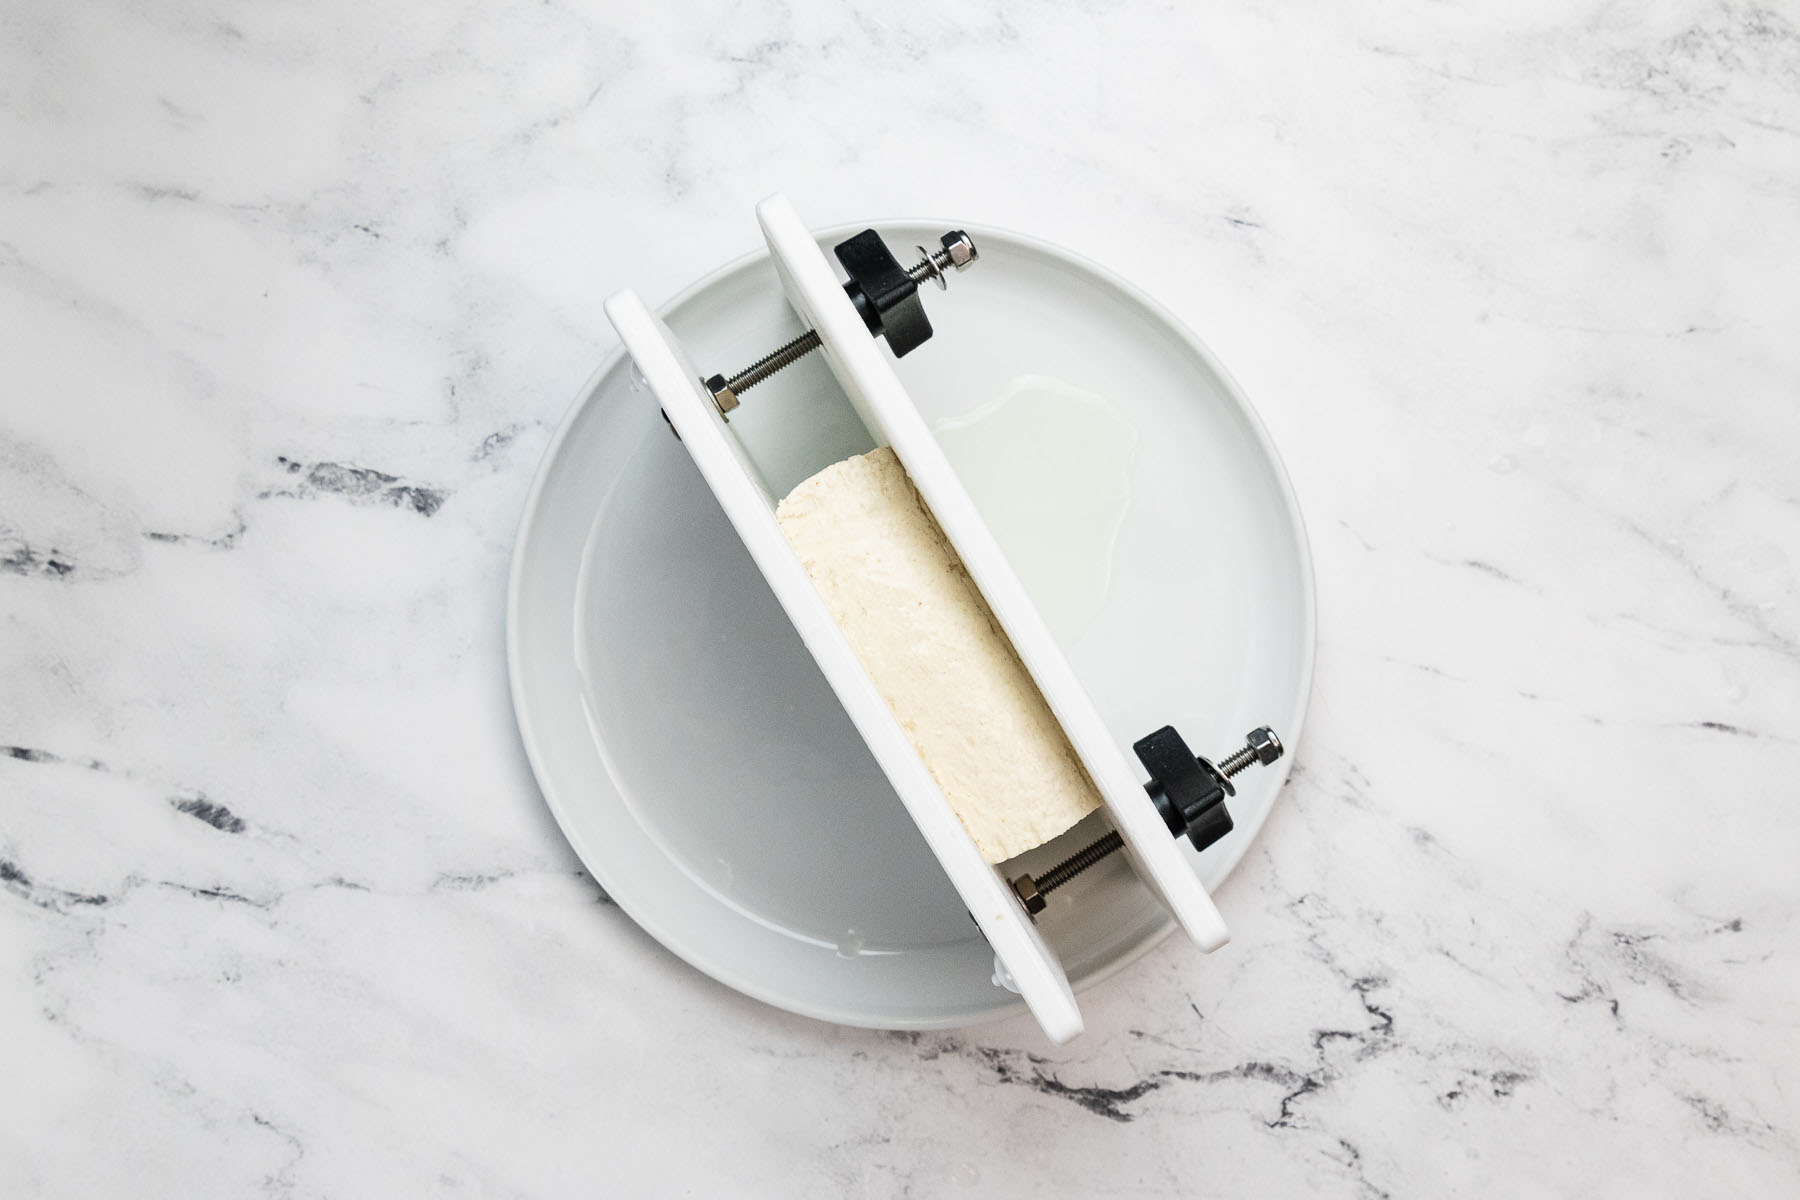 image of a tofu press